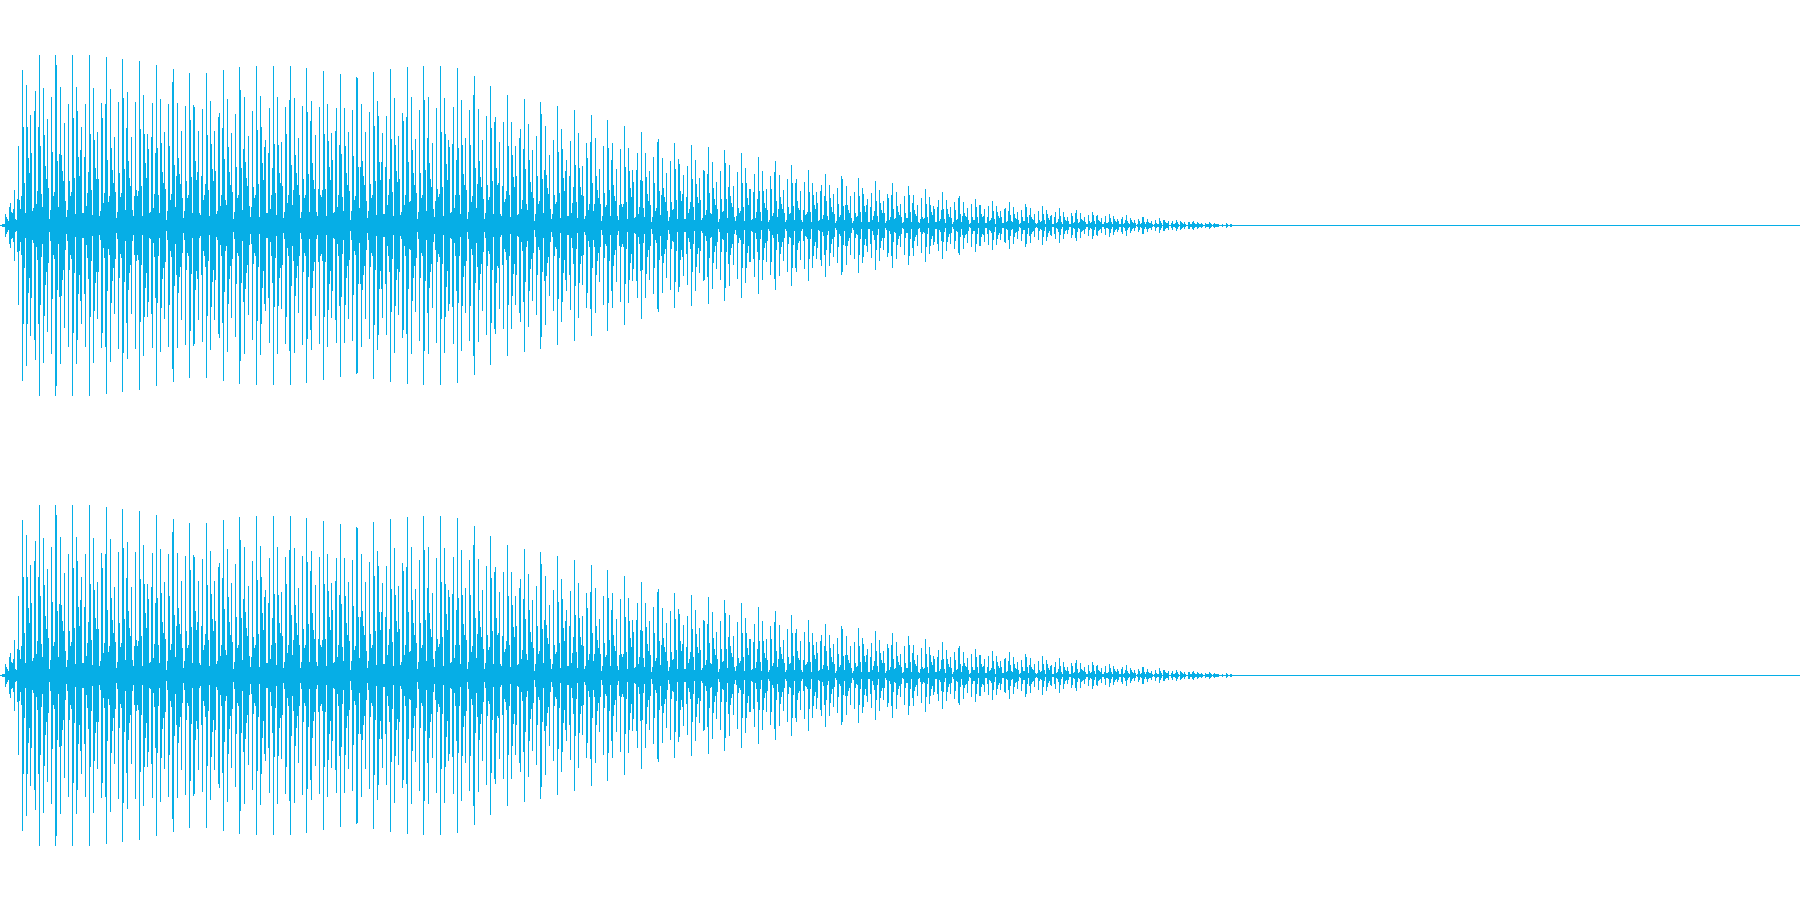 OctaveCom アプリ用タッチ音5の再生済みの波形